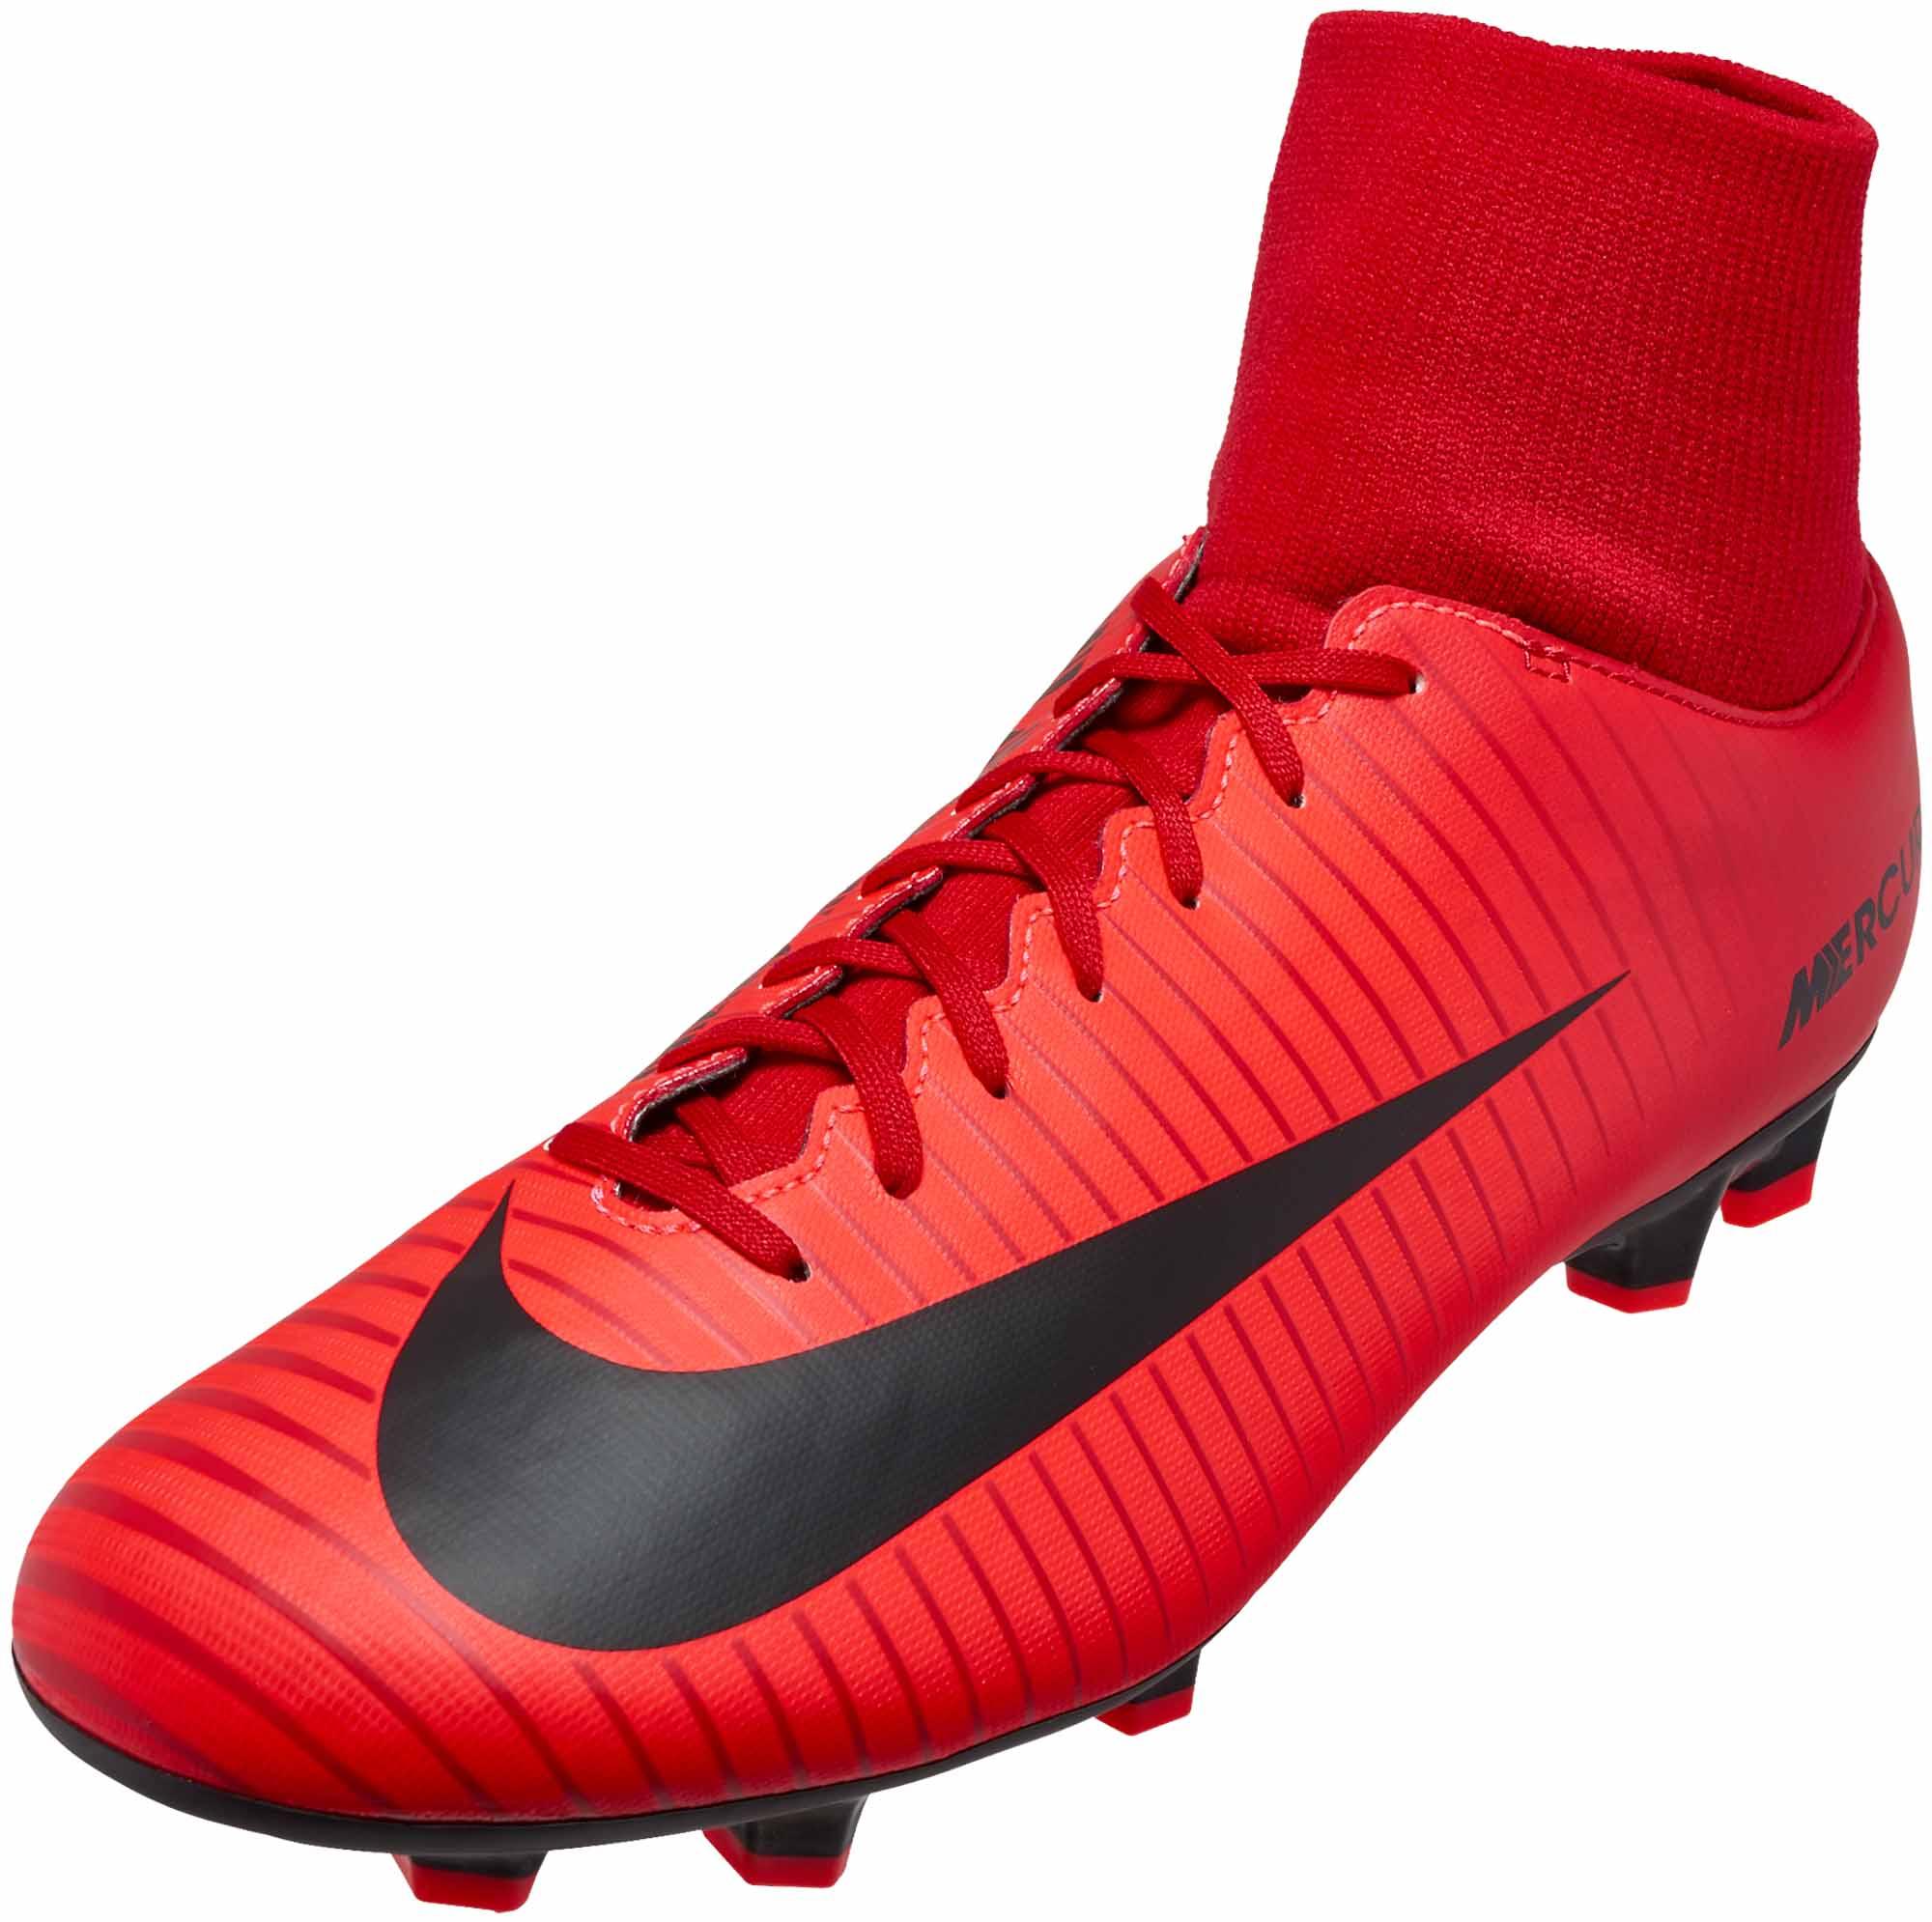 new styles 5bd77 32191 Nike Mercurial Victory VI DF FG – University Red/Black